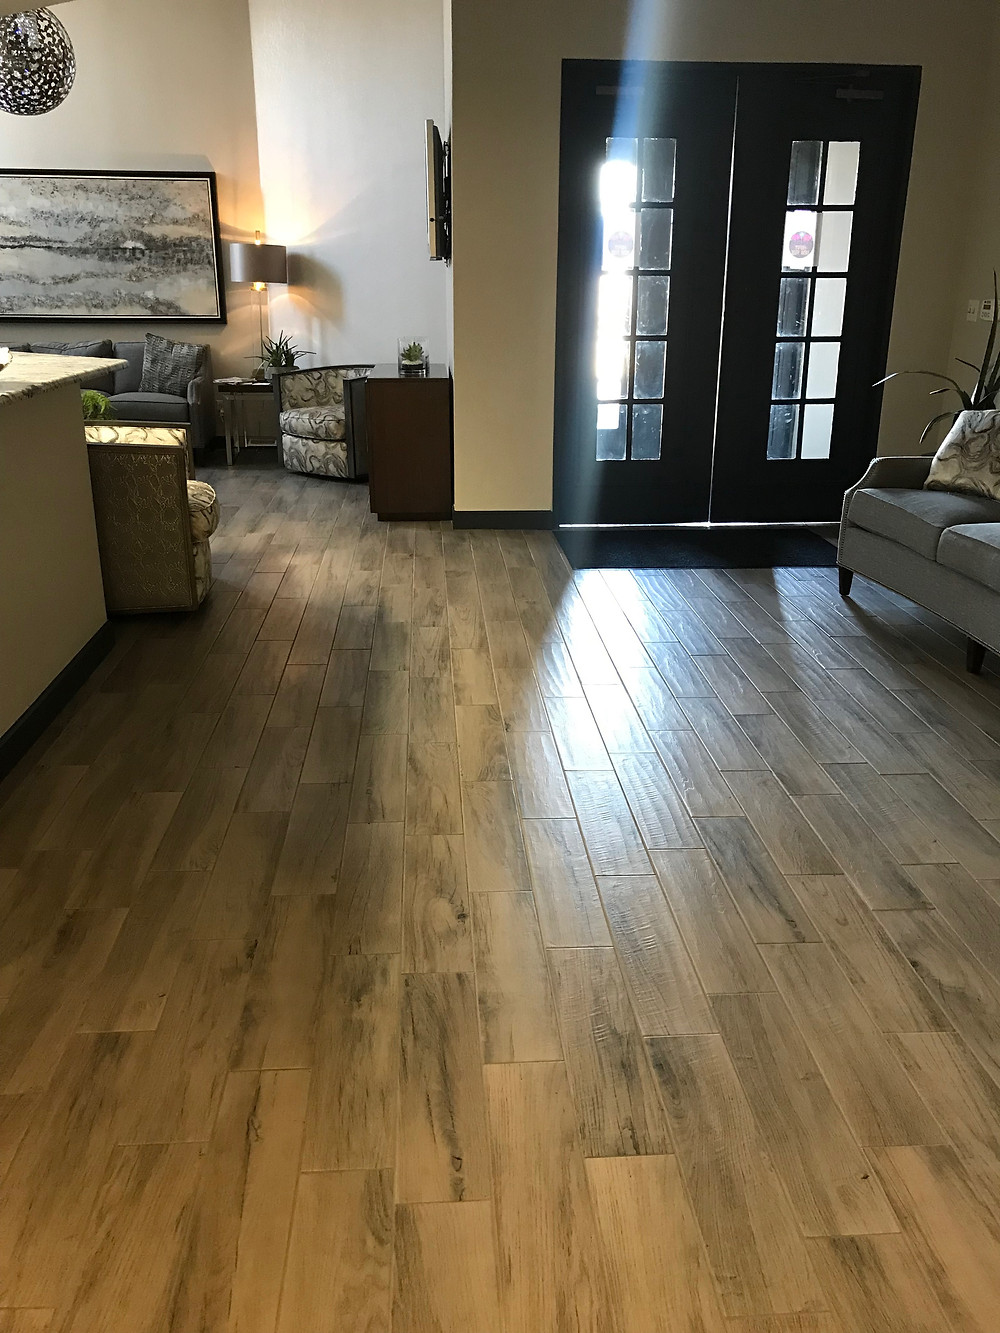 6x36 wood look plank tiles